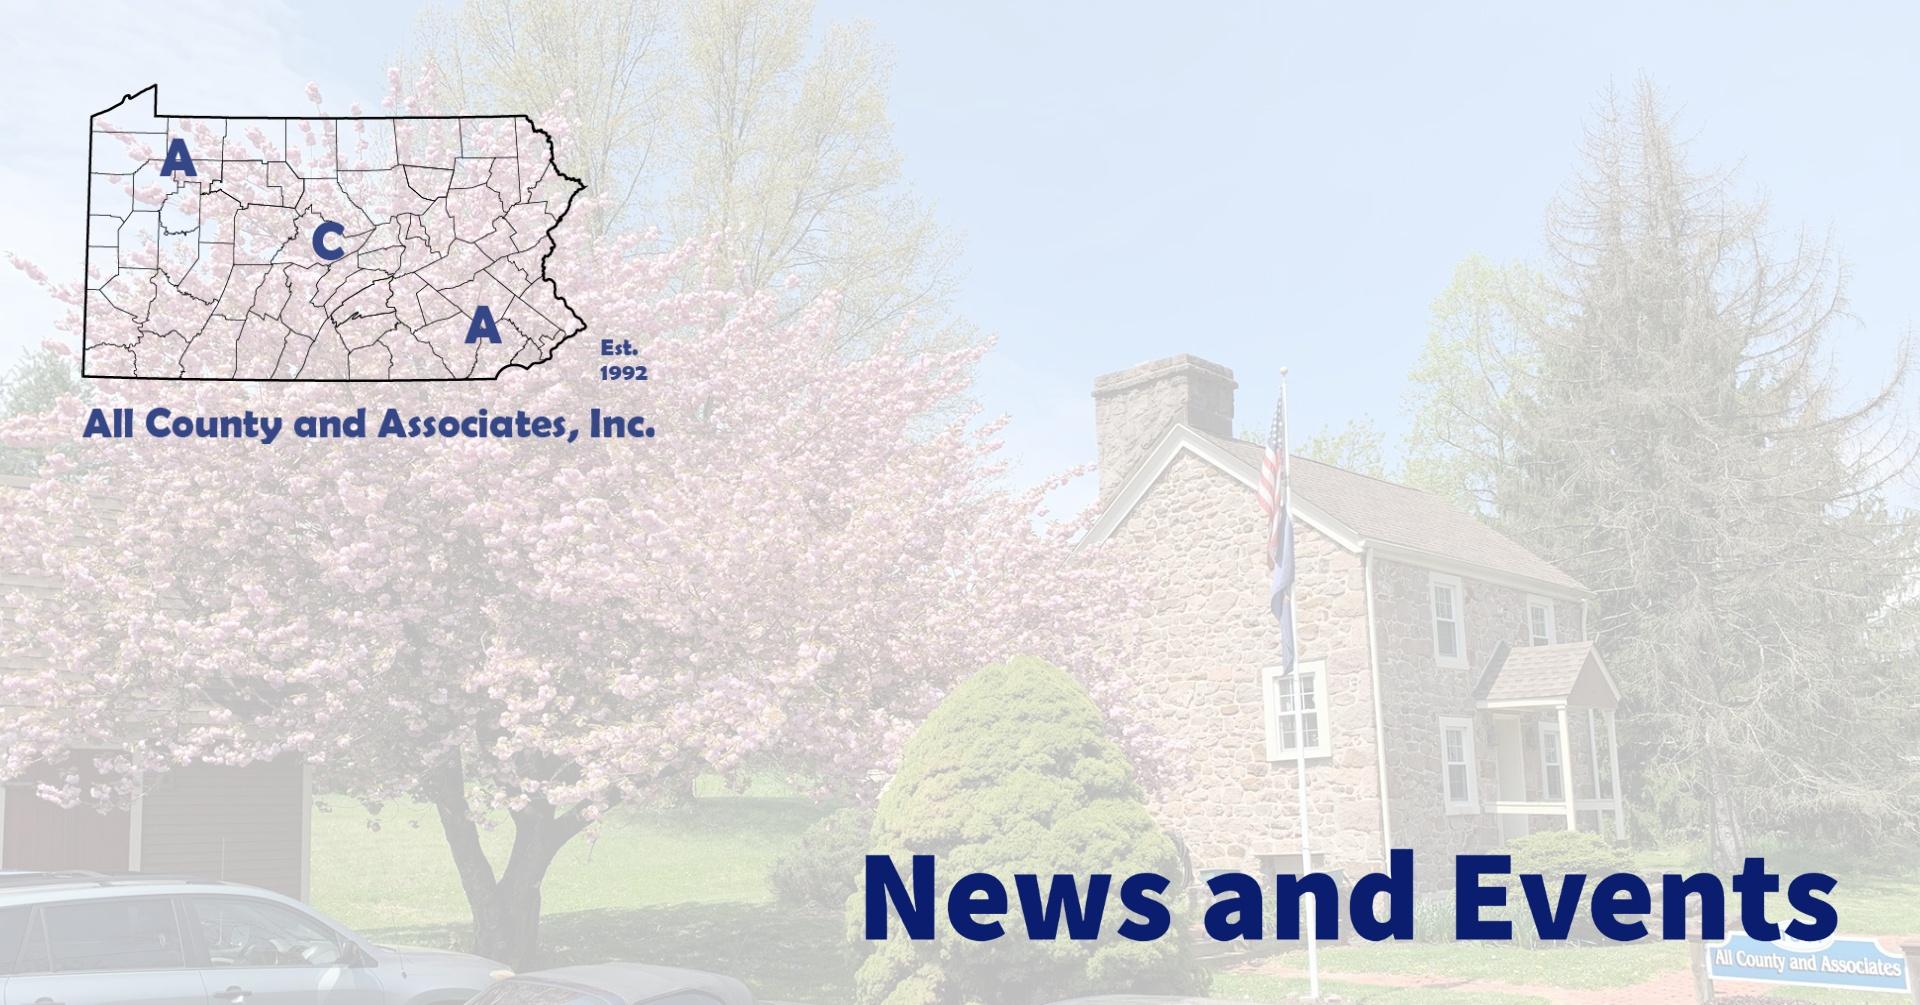 Civil Engineering Firm News